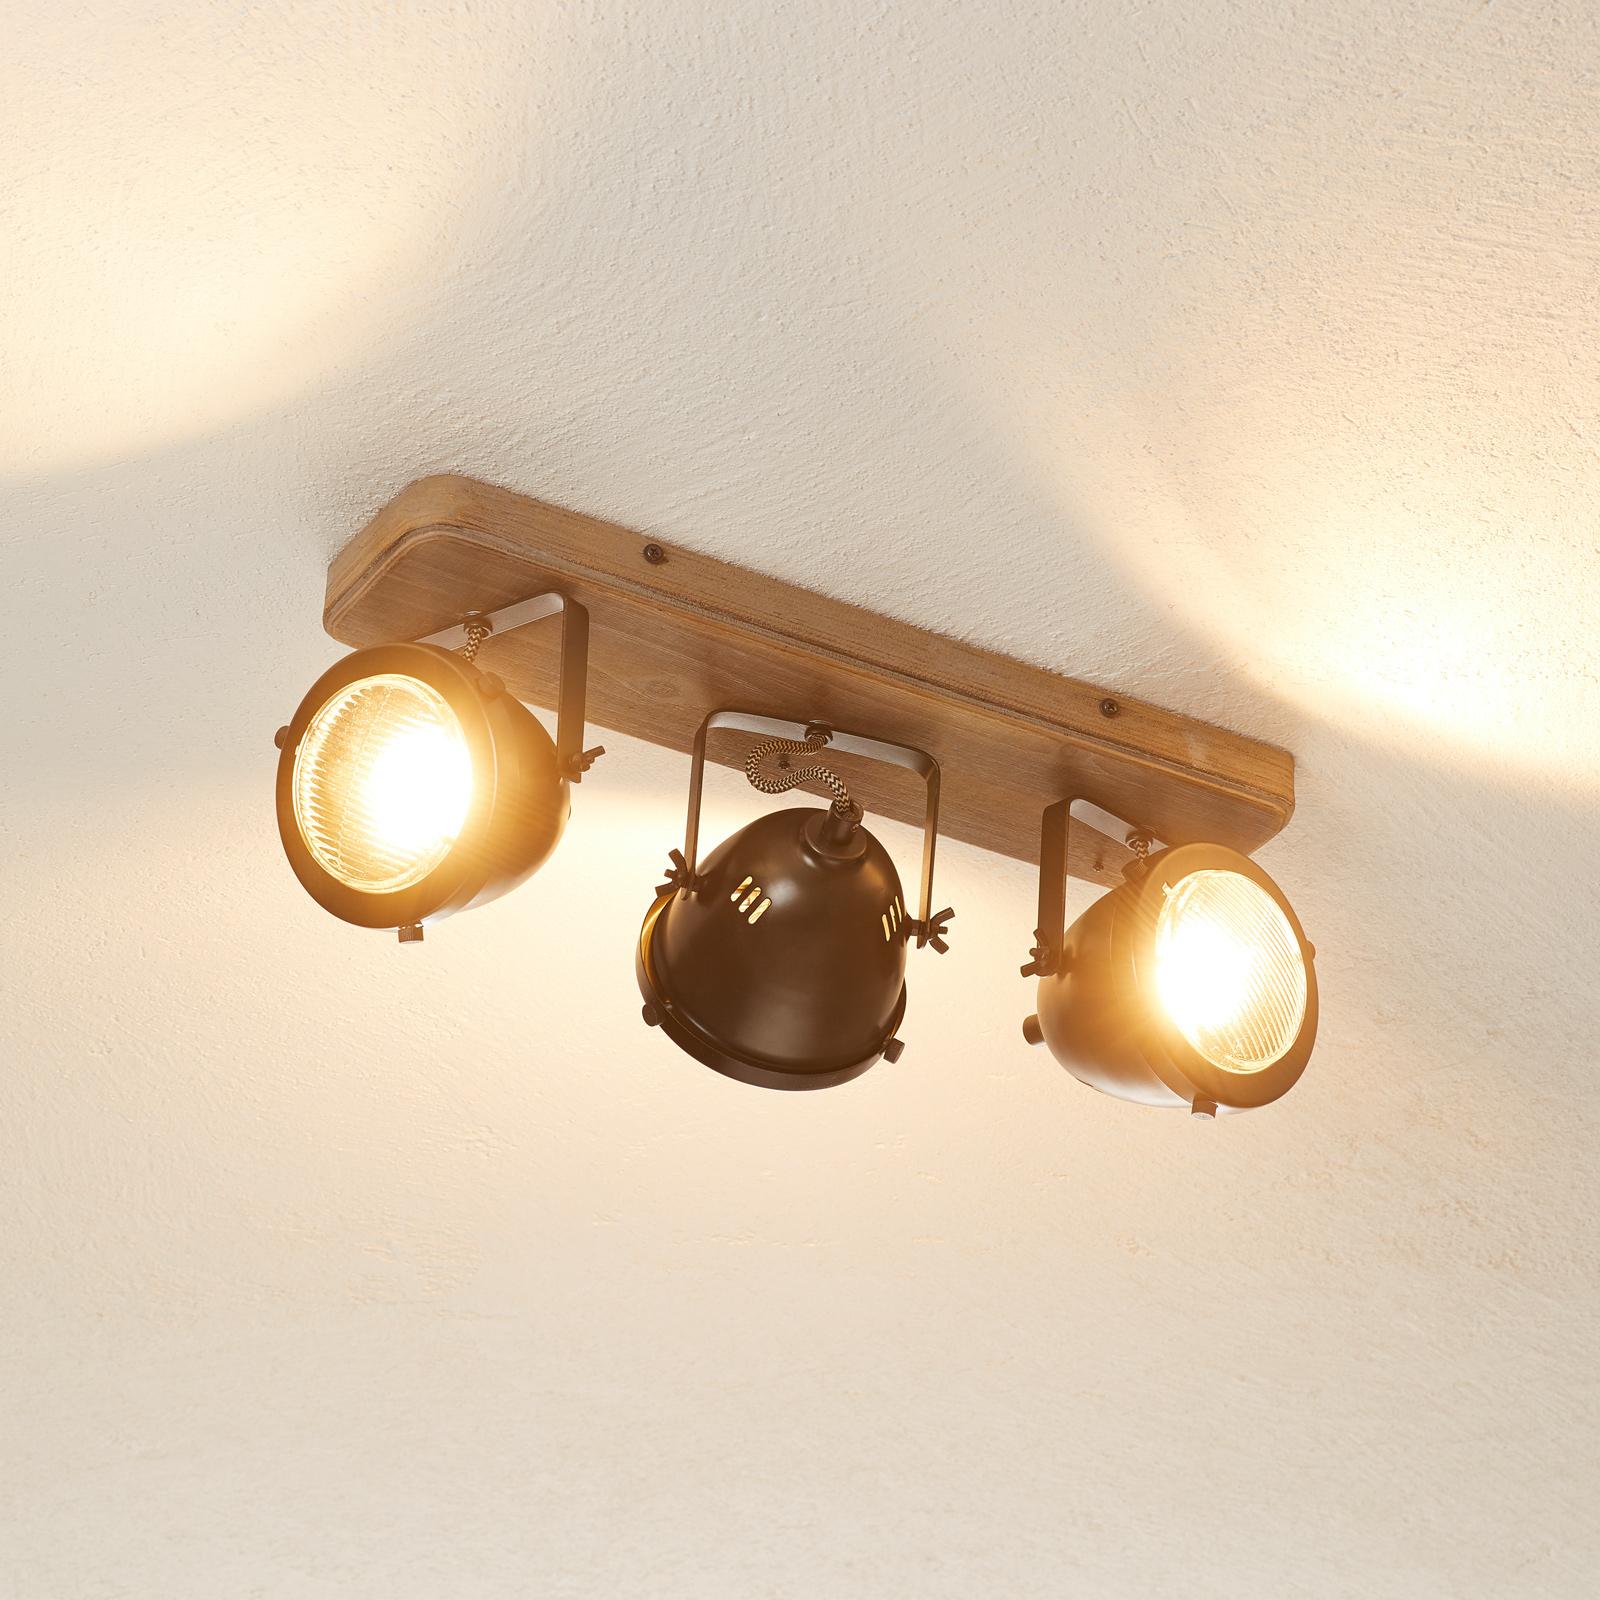 Lampa sufitowa Carmen Wood, 3-pkt.